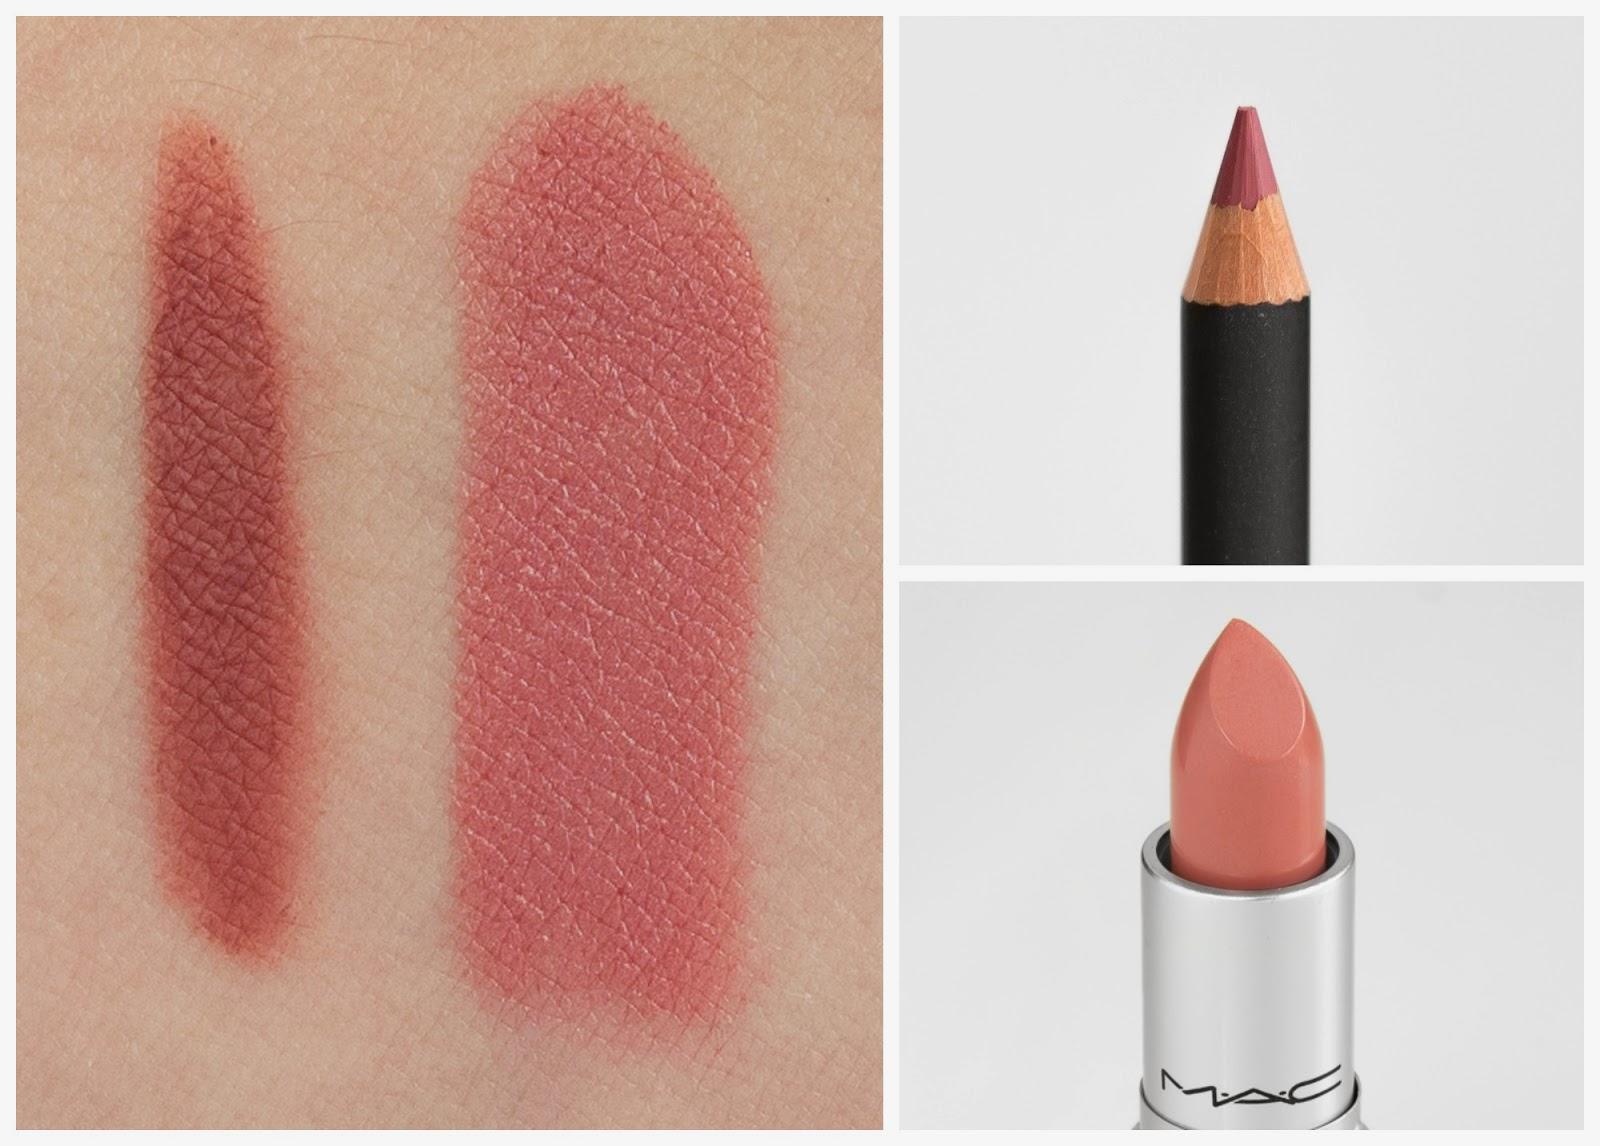 Mac Soar lip liner & Brave lipstick